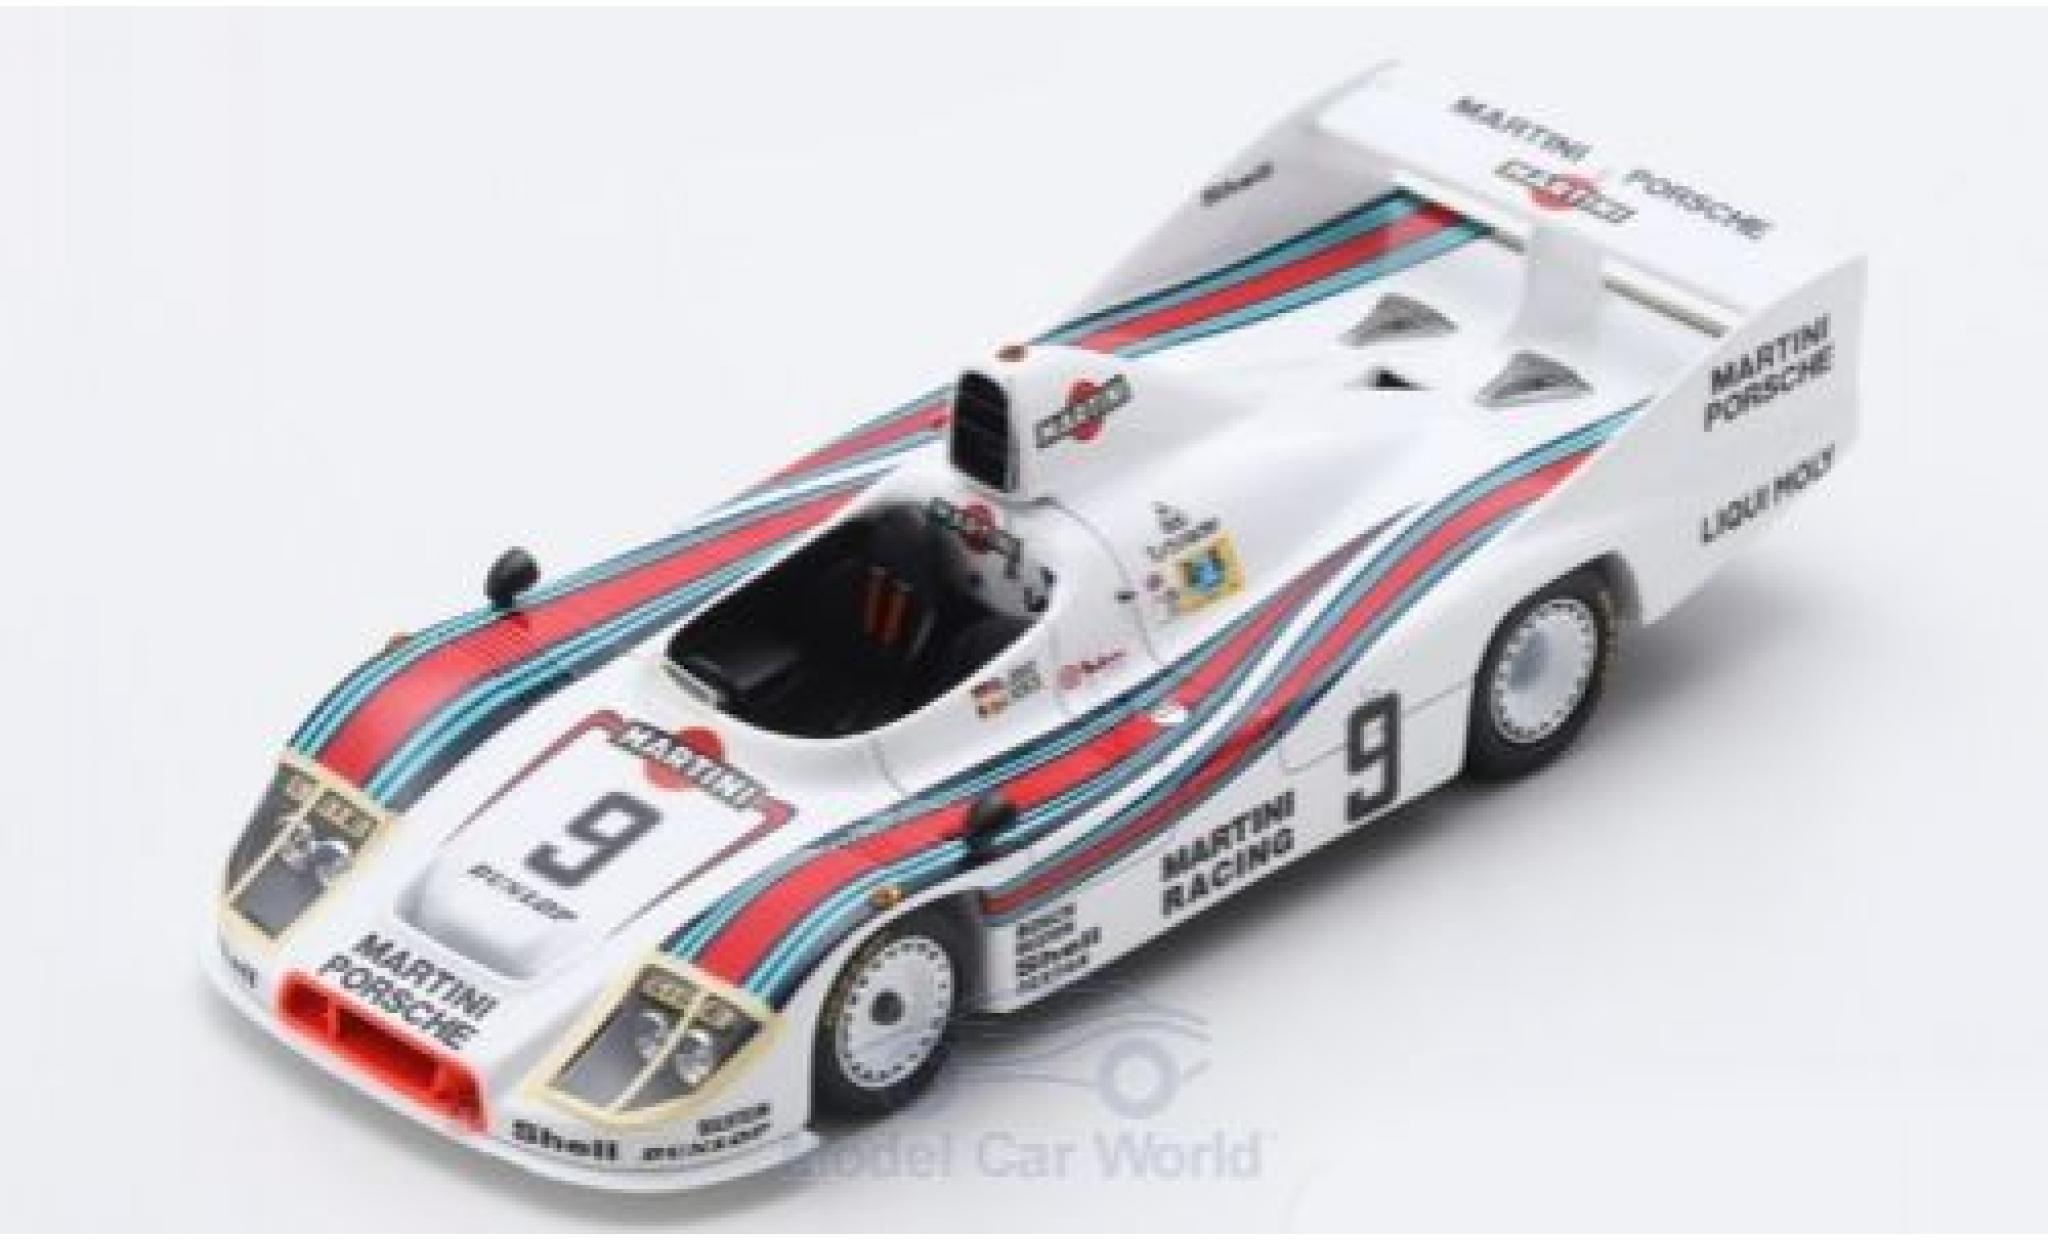 Porsche 908 1/43 Spark /80 RHD No.9 Martini Martini 24h Le Mans 1980 J.Ickx/R.Joest